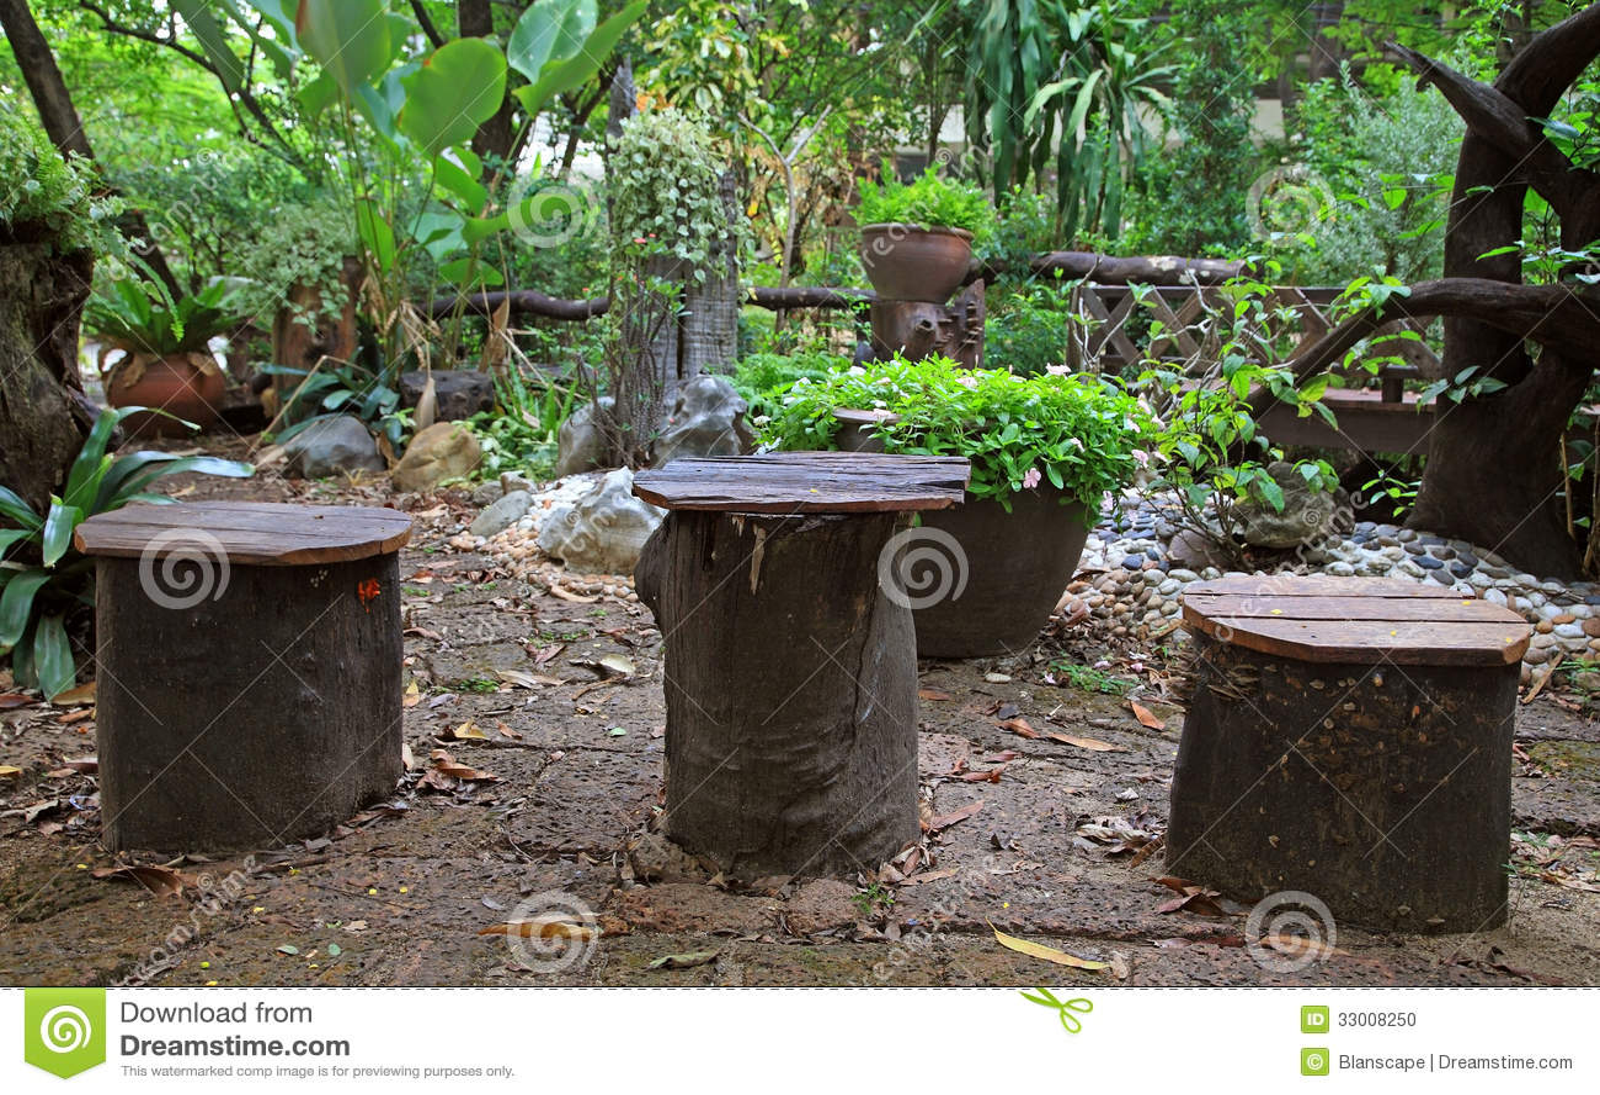 old wooden desk chair steel price in delhi tree trunk seats stock photo. image of empty, rural, fallen - 33008250